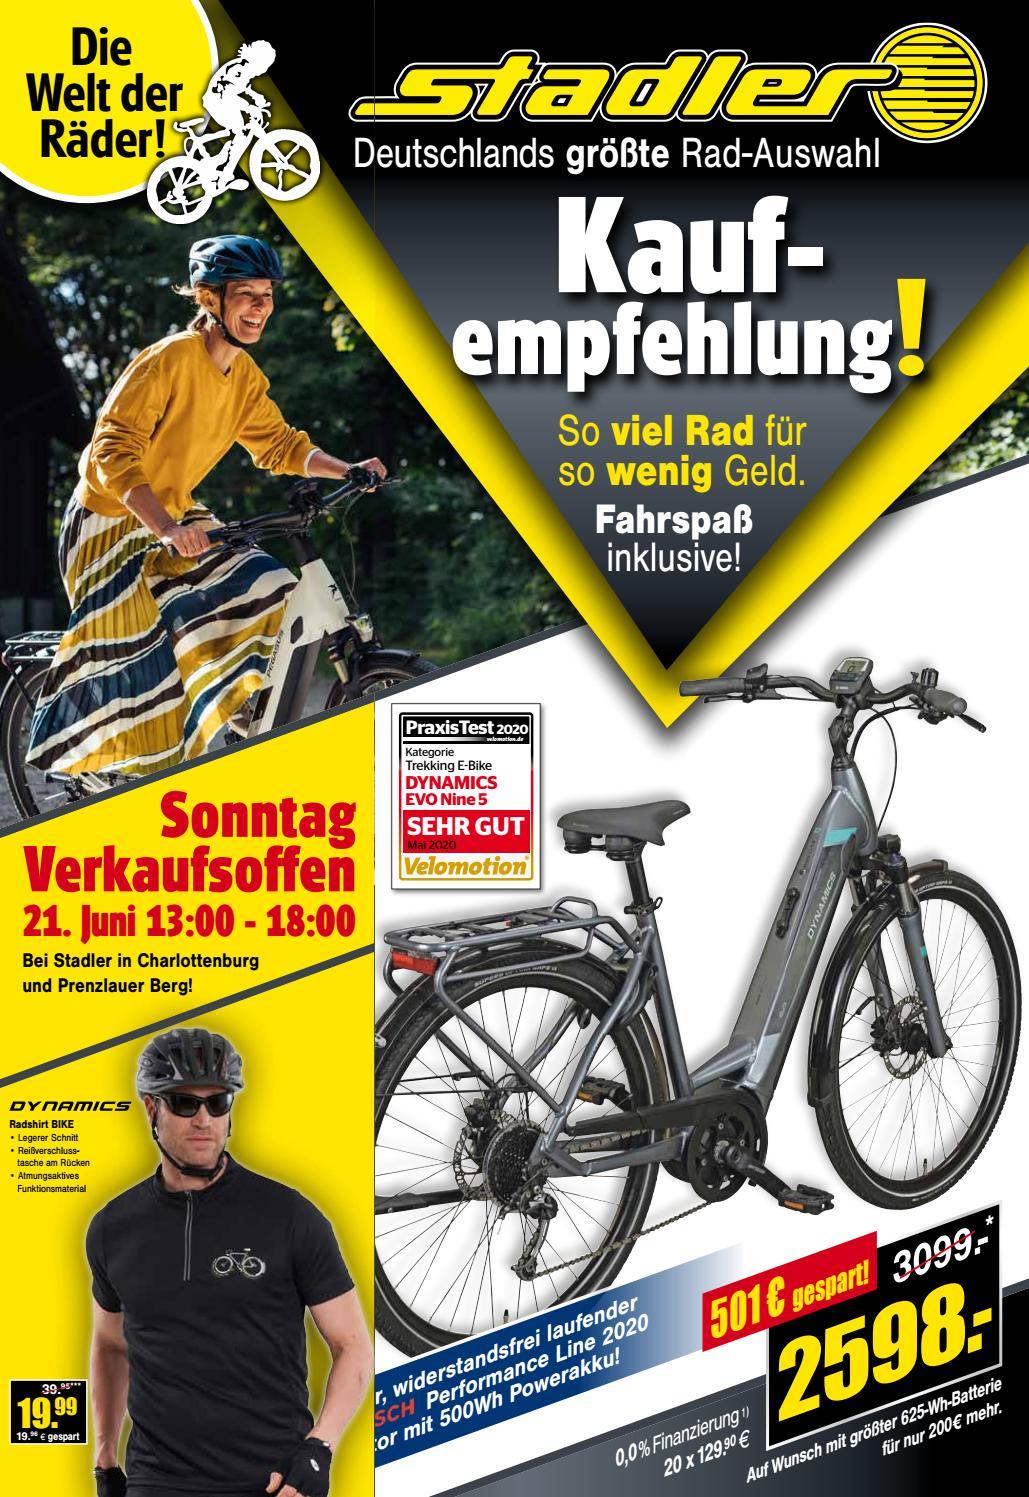 Sonntag zweirad verkaufsoffener stadler fürth Fahrrad Stadler